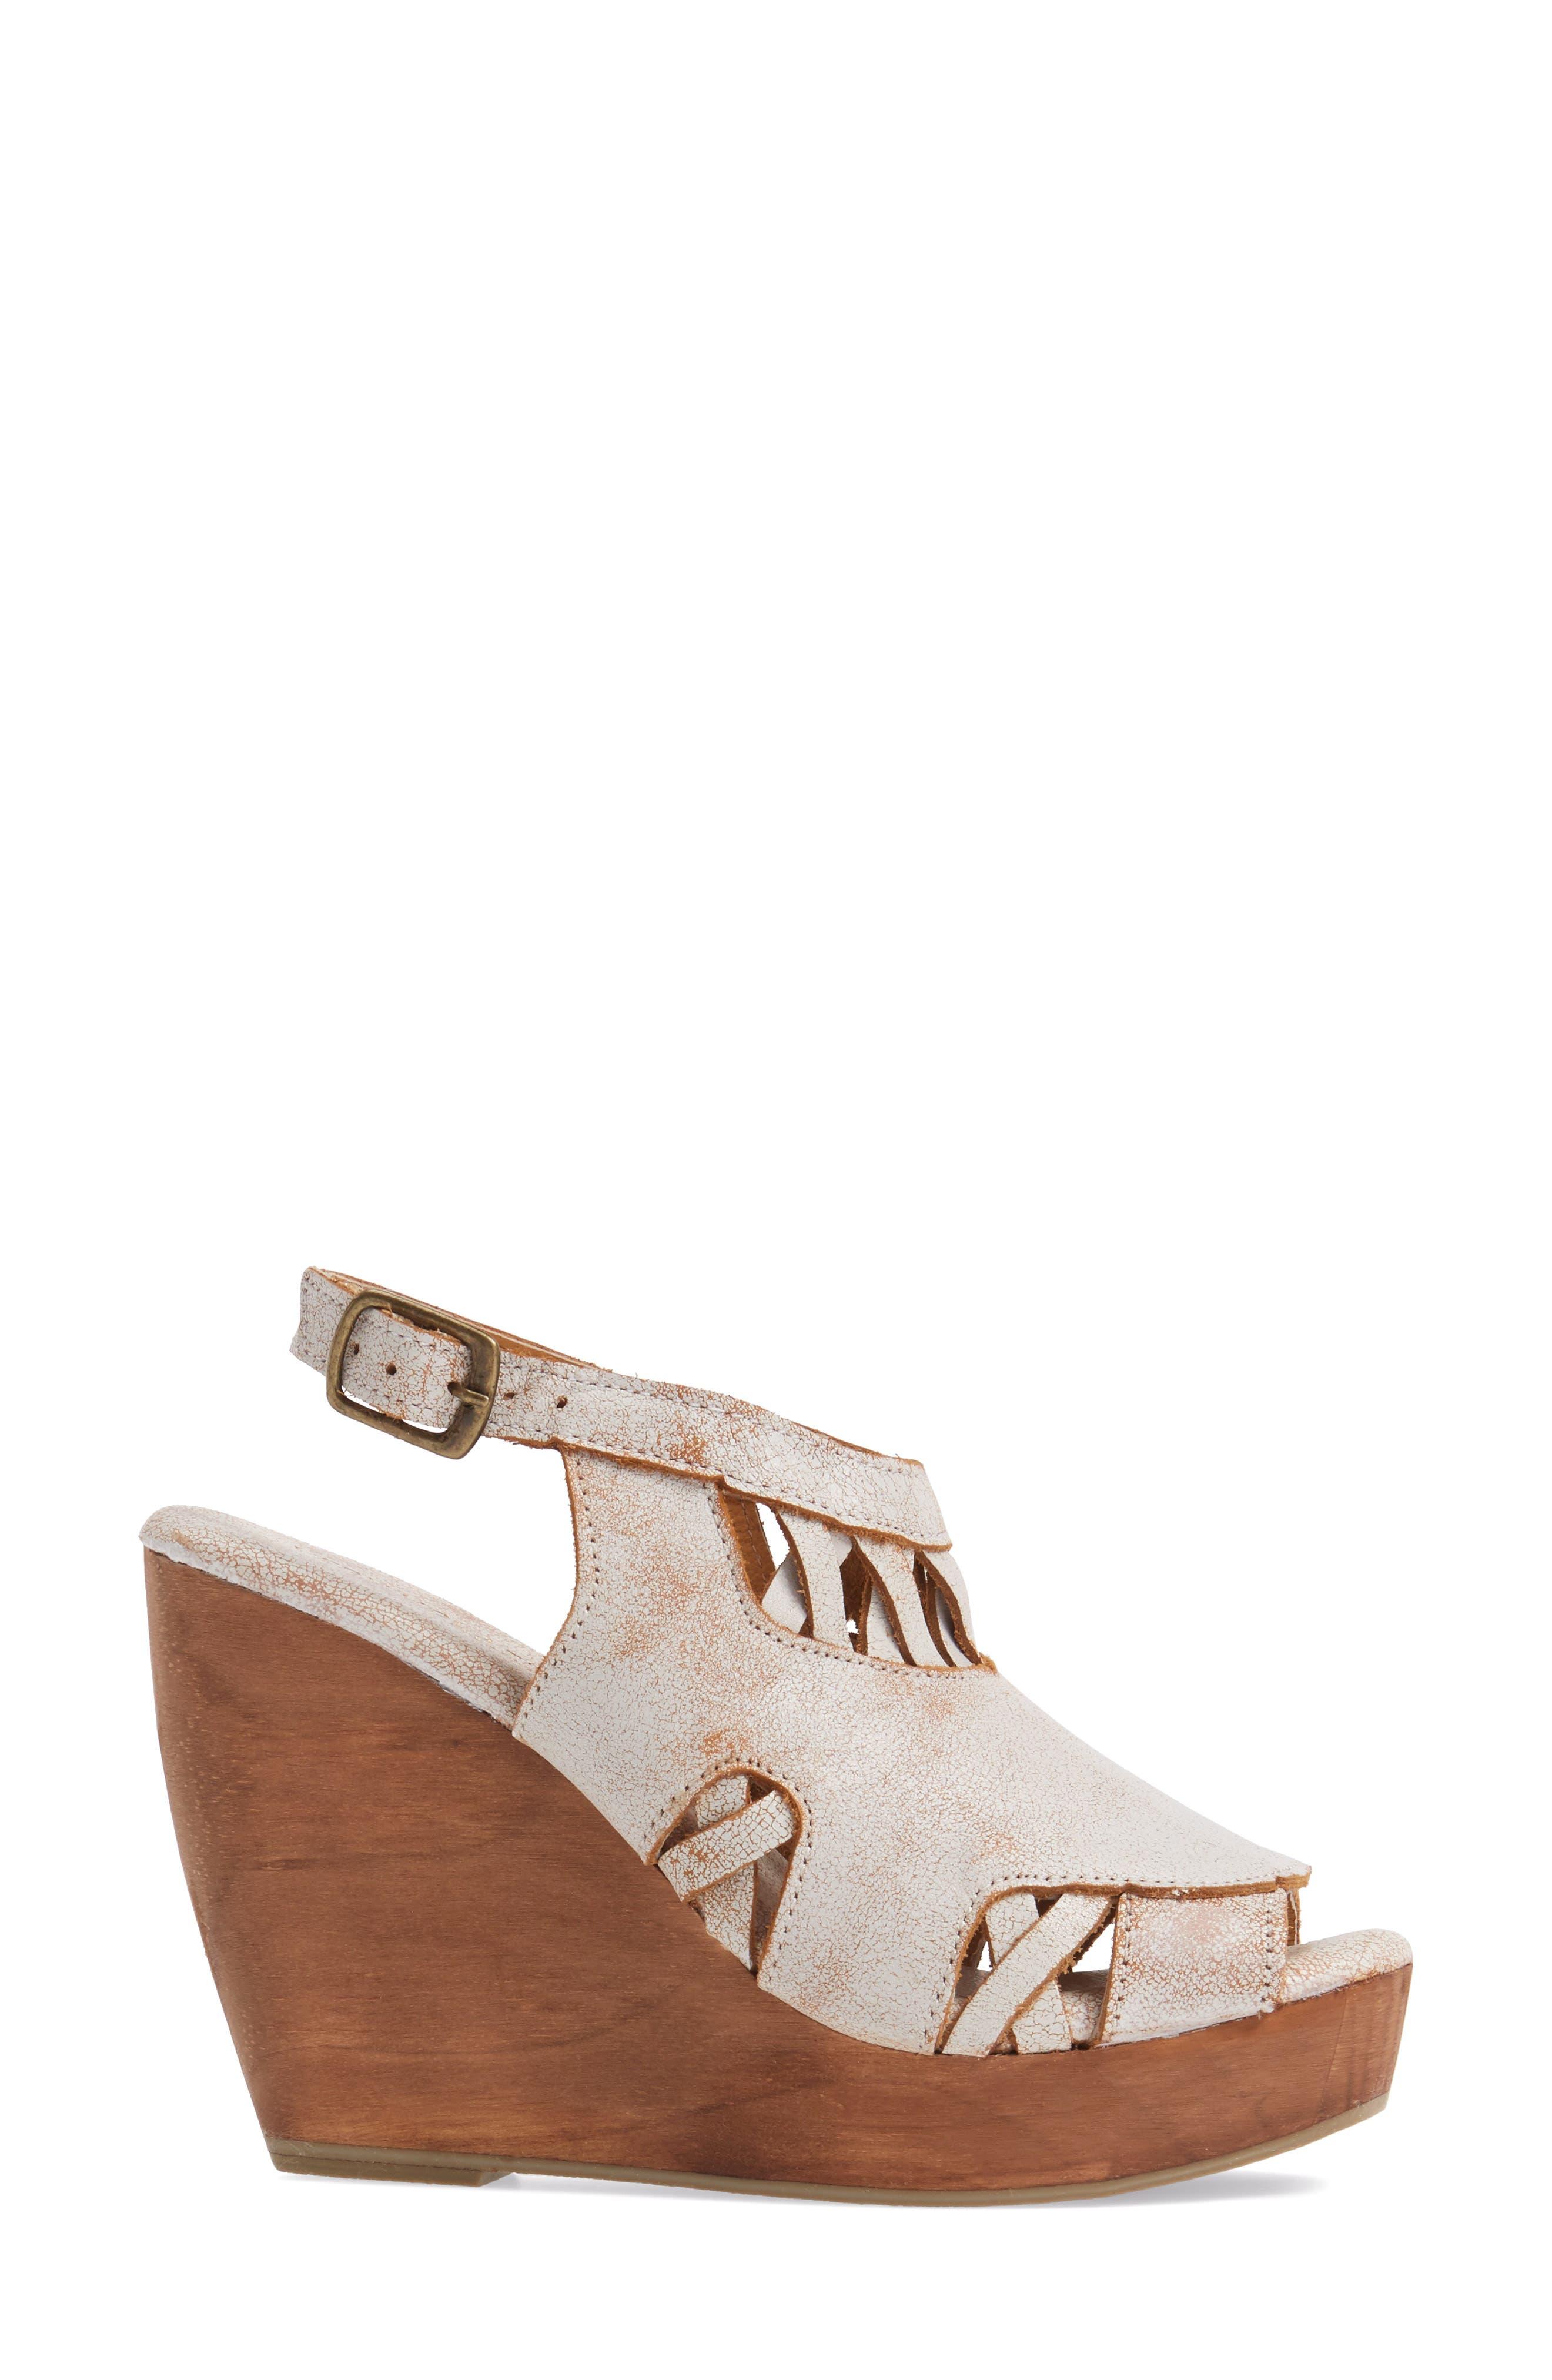 Alternate Image 3  - Very Volatile Sloane Platform Wedge Sandal (Women)